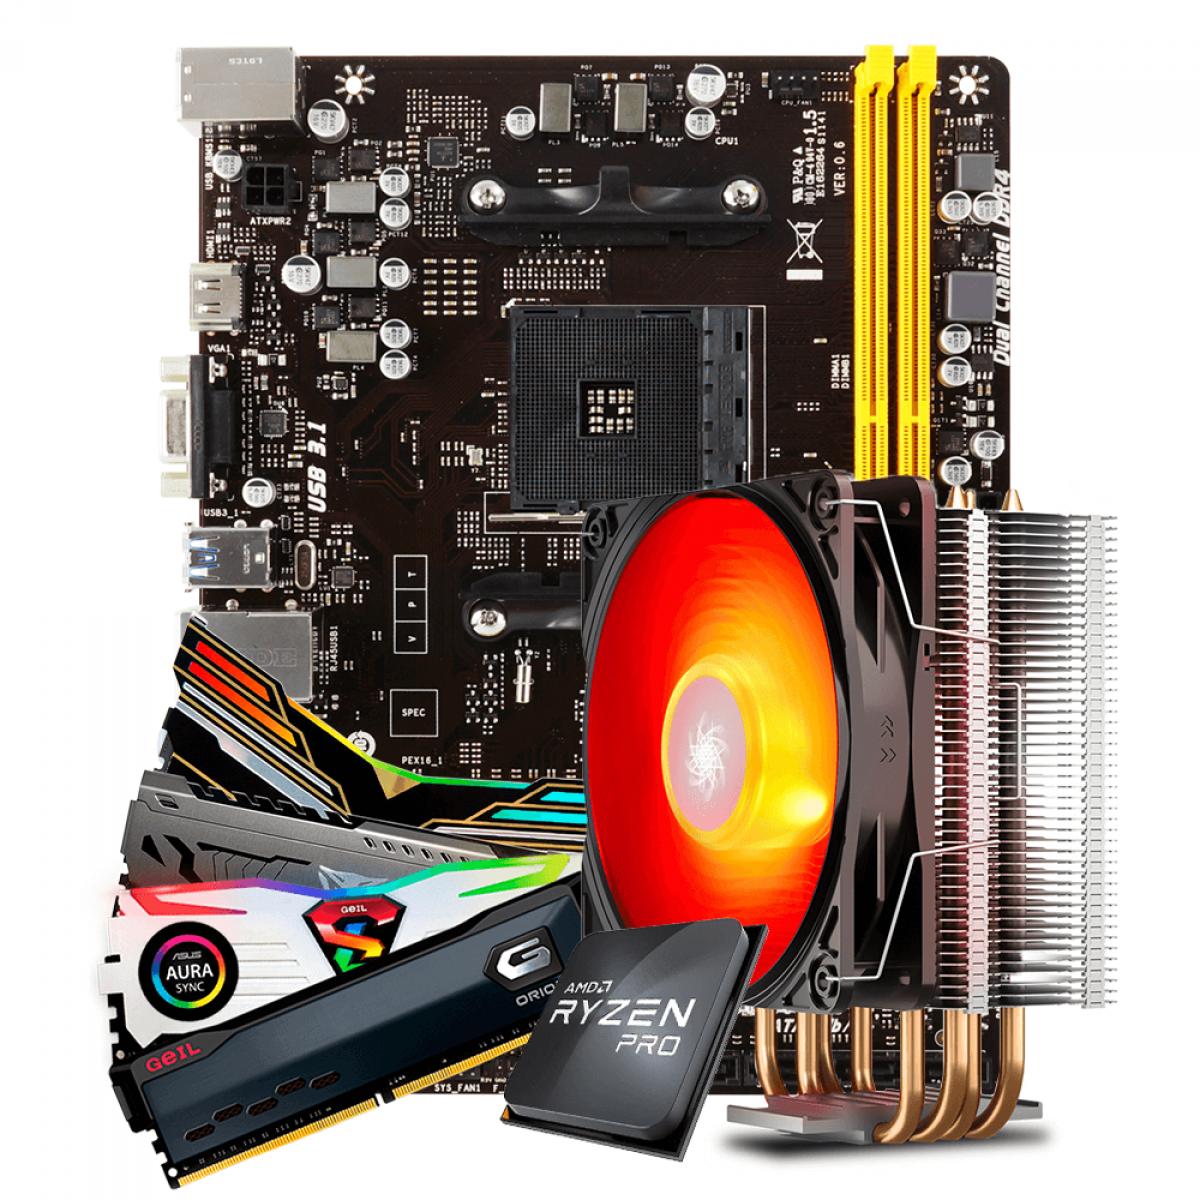 Kit Upgrade Placa Mãe Biostar A320MH DDR4 AMD AM4 + Processador AMD Ryzen 3 PRO 3200GE 3.3GHz + Cooler + Memória DDR4 8GB 3000MHz